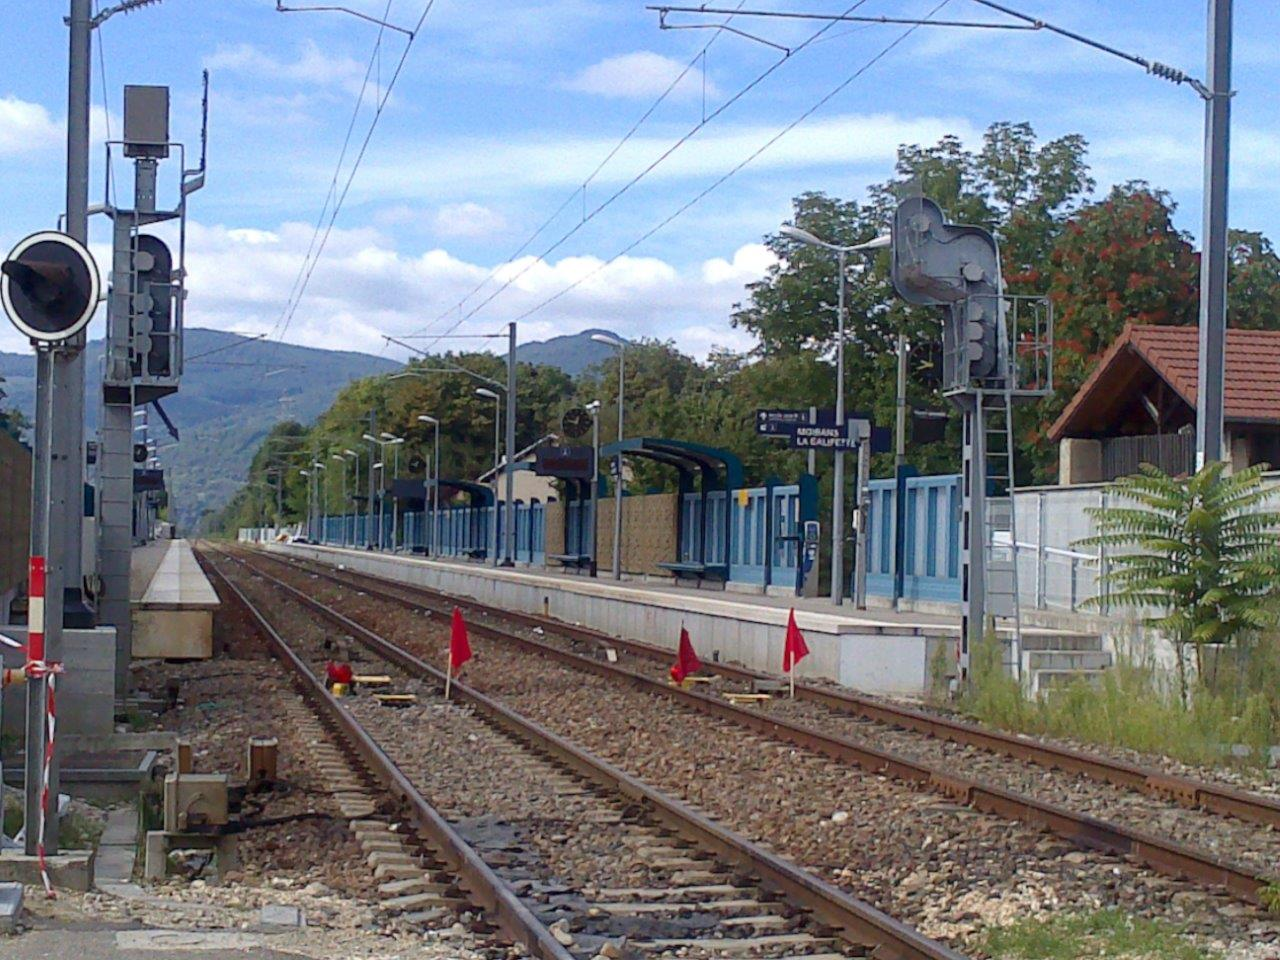 gare-de-moirans-galifette-train-station